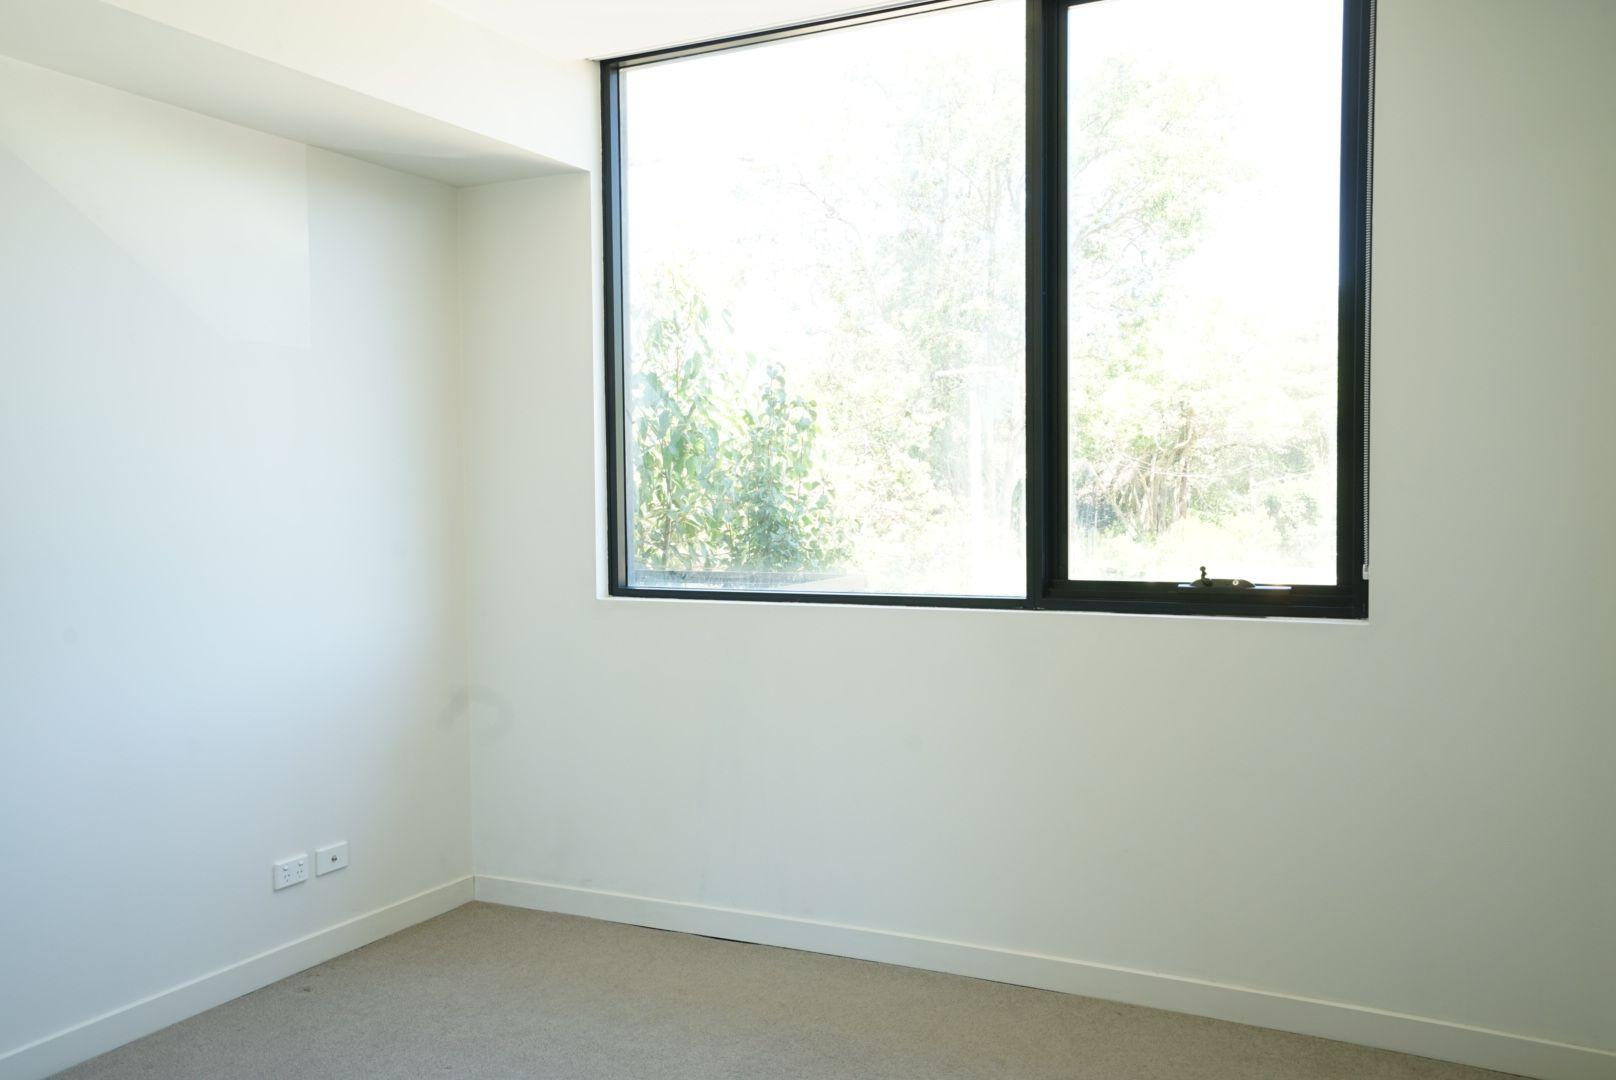 37/17-25  Boundary, Roseville NSW 2069, Image 2